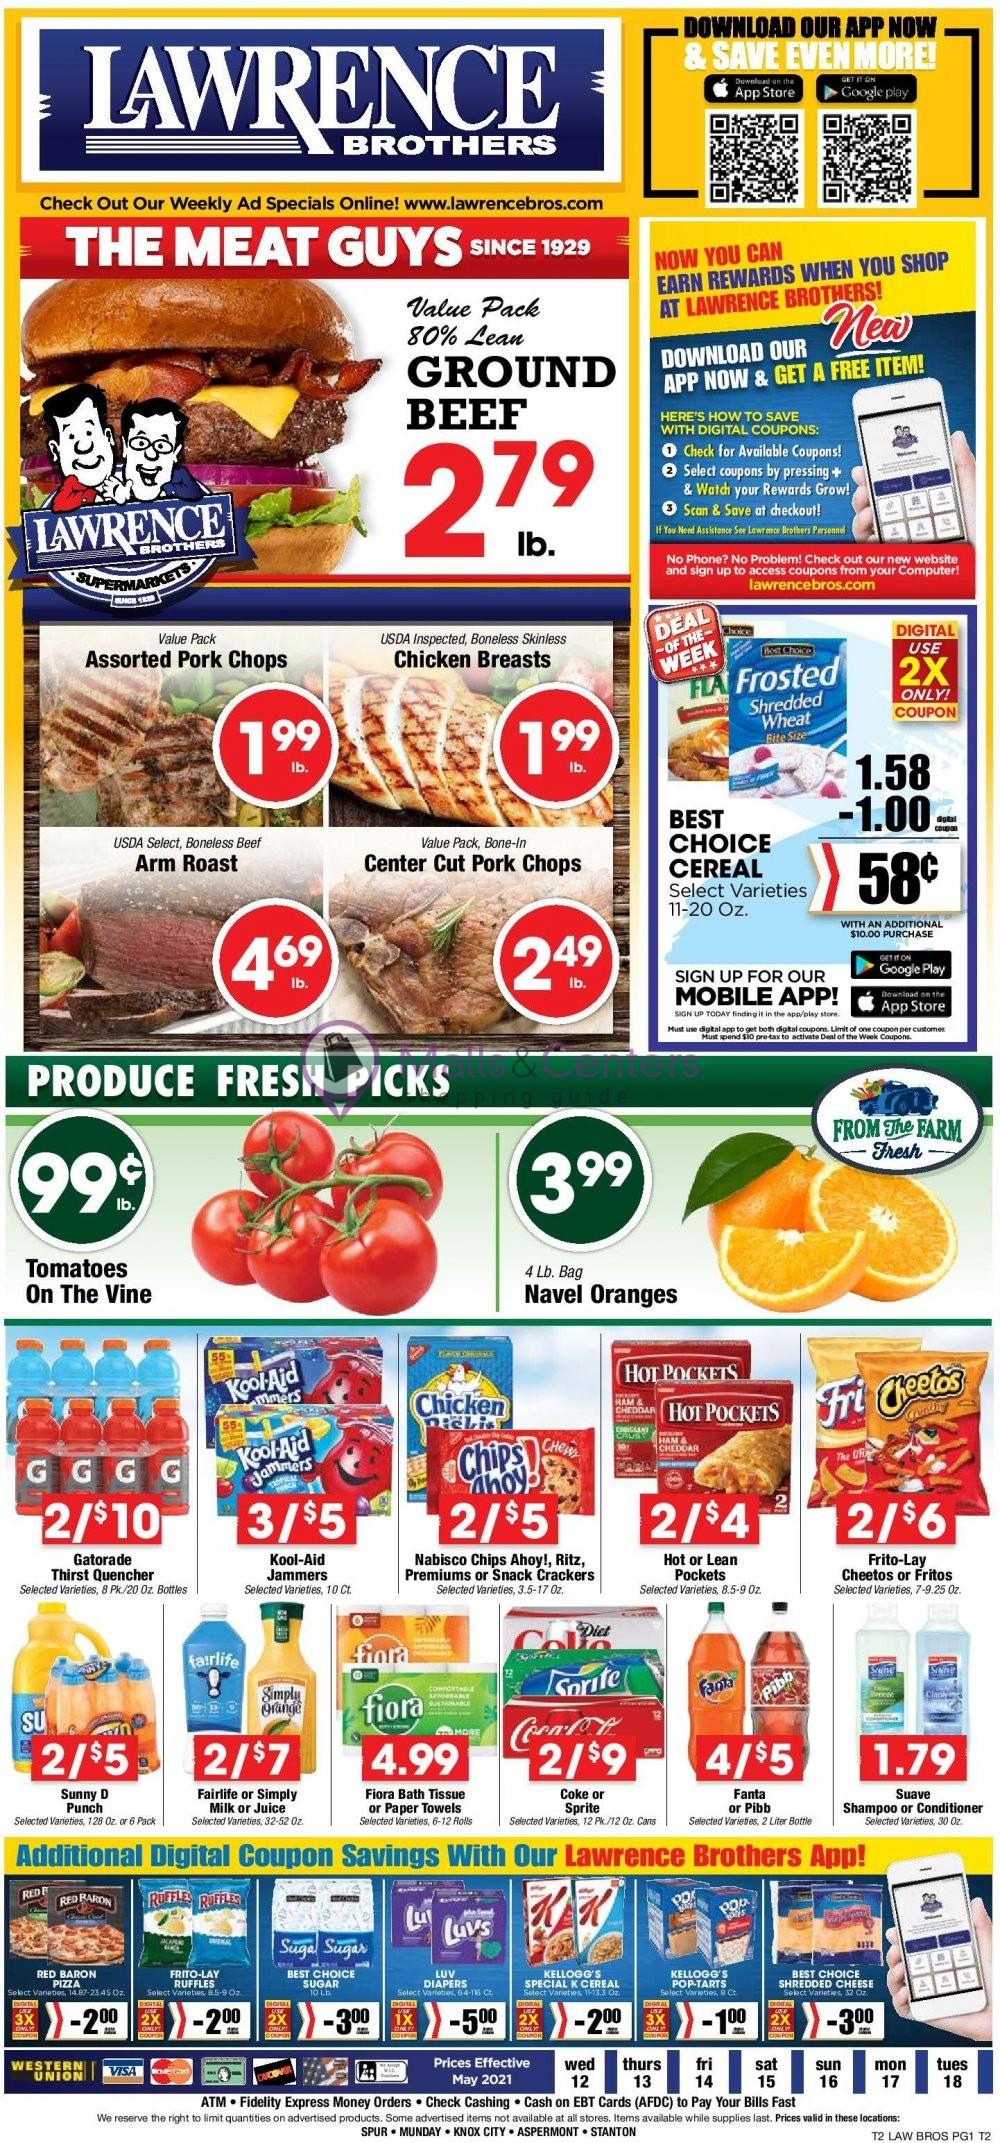 weekly ads CashSaver - page 1 - mallscenters.com